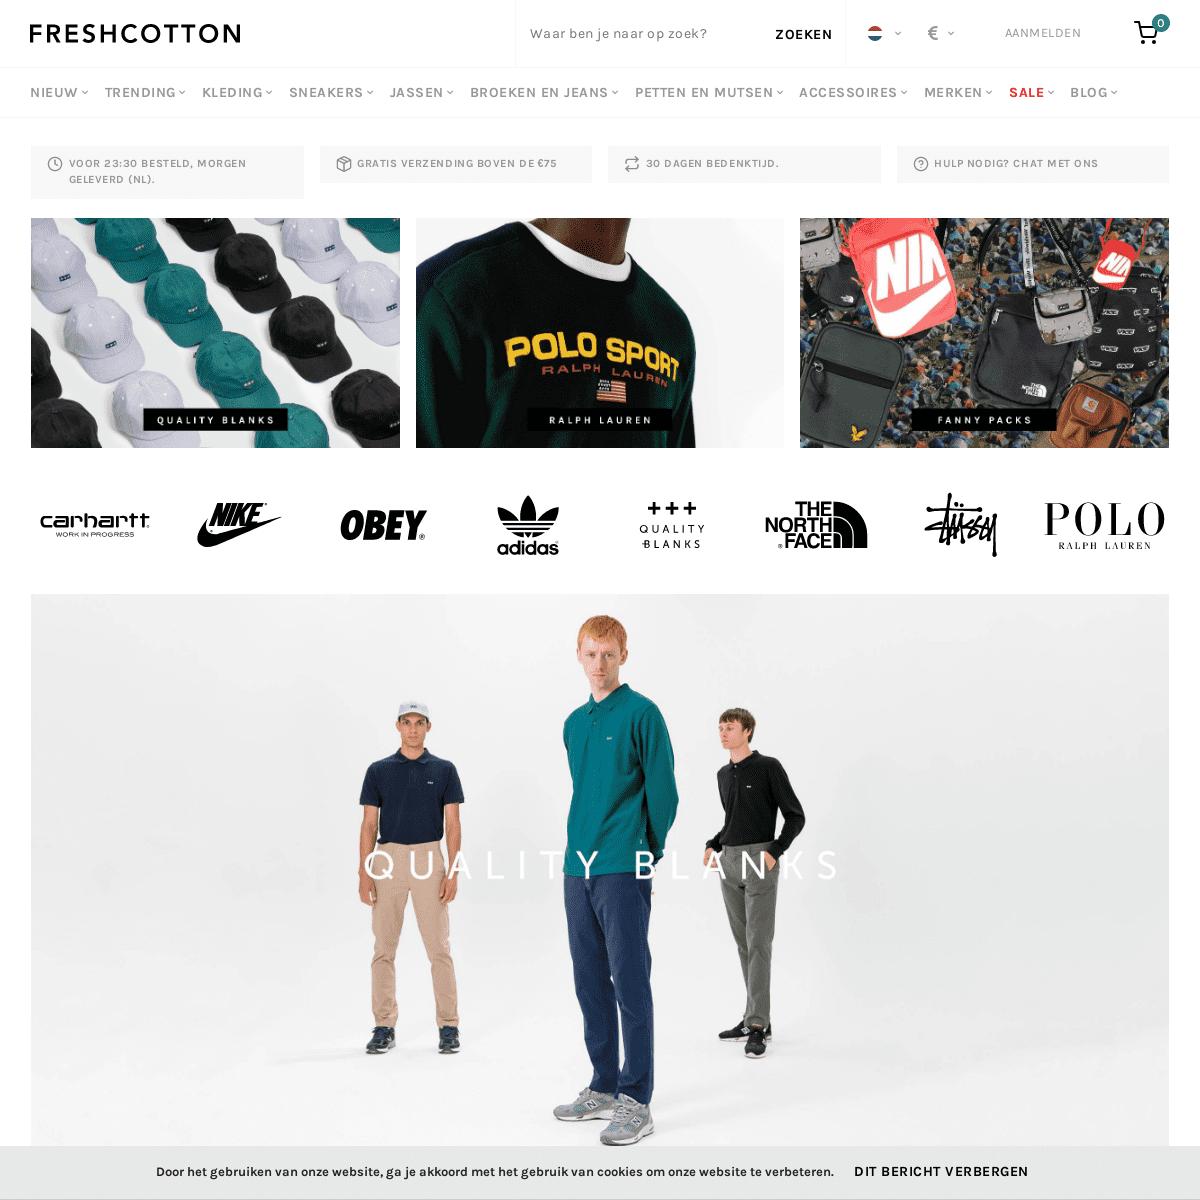 FRESHCOTTON on Instagram: Fall tones on the new Nike